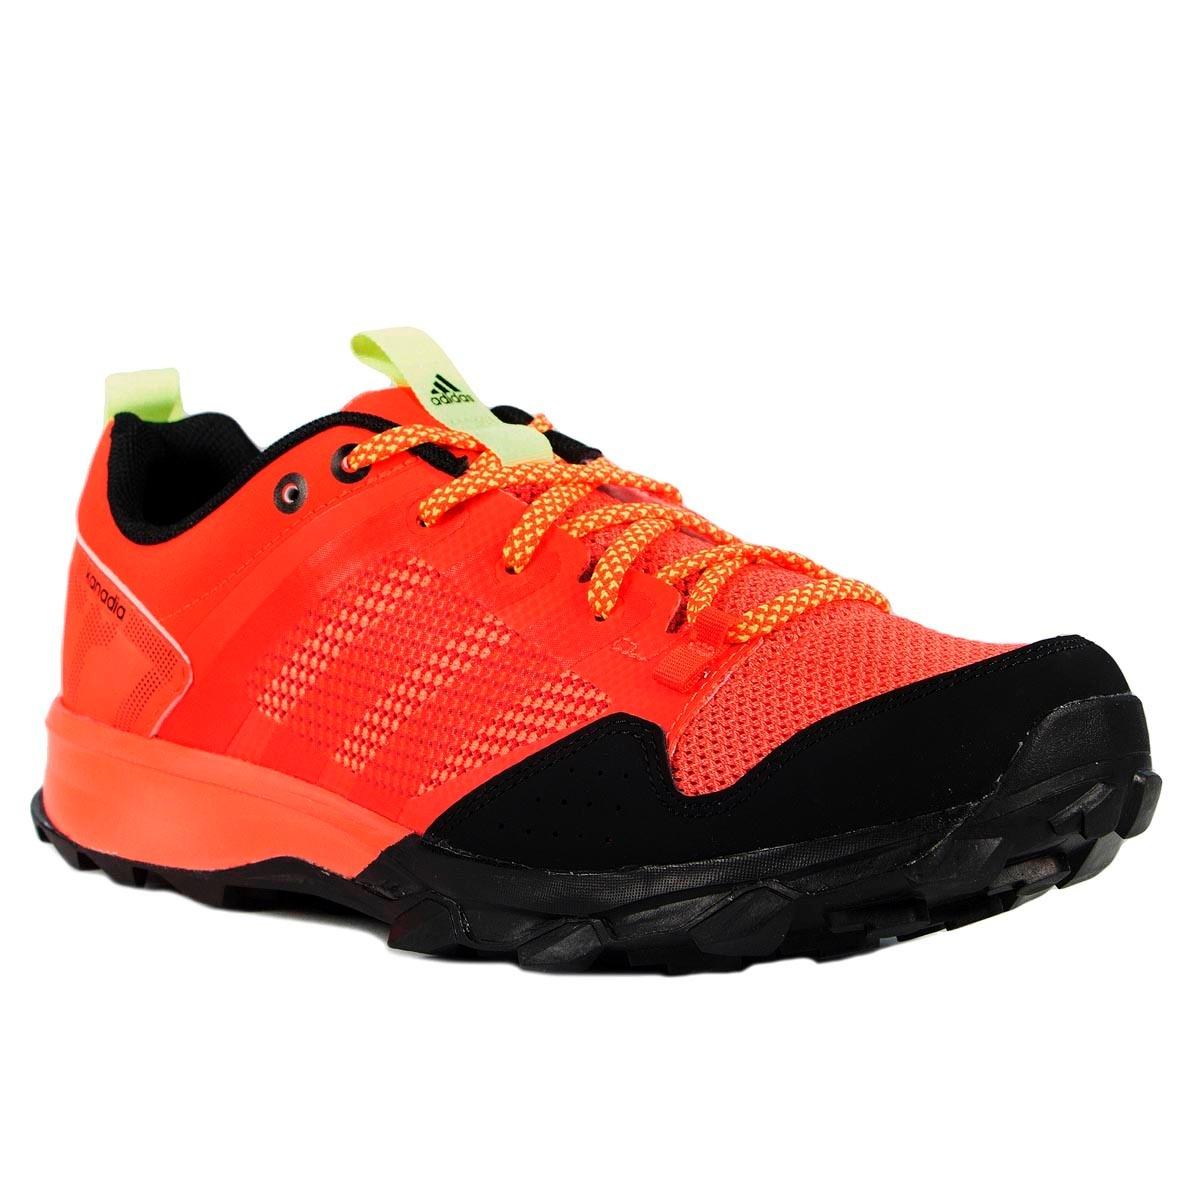 pretty nice 5b94e d2d89 zapatillas adidas kanadia 7 trail hombre rojo. Cargando zoom.